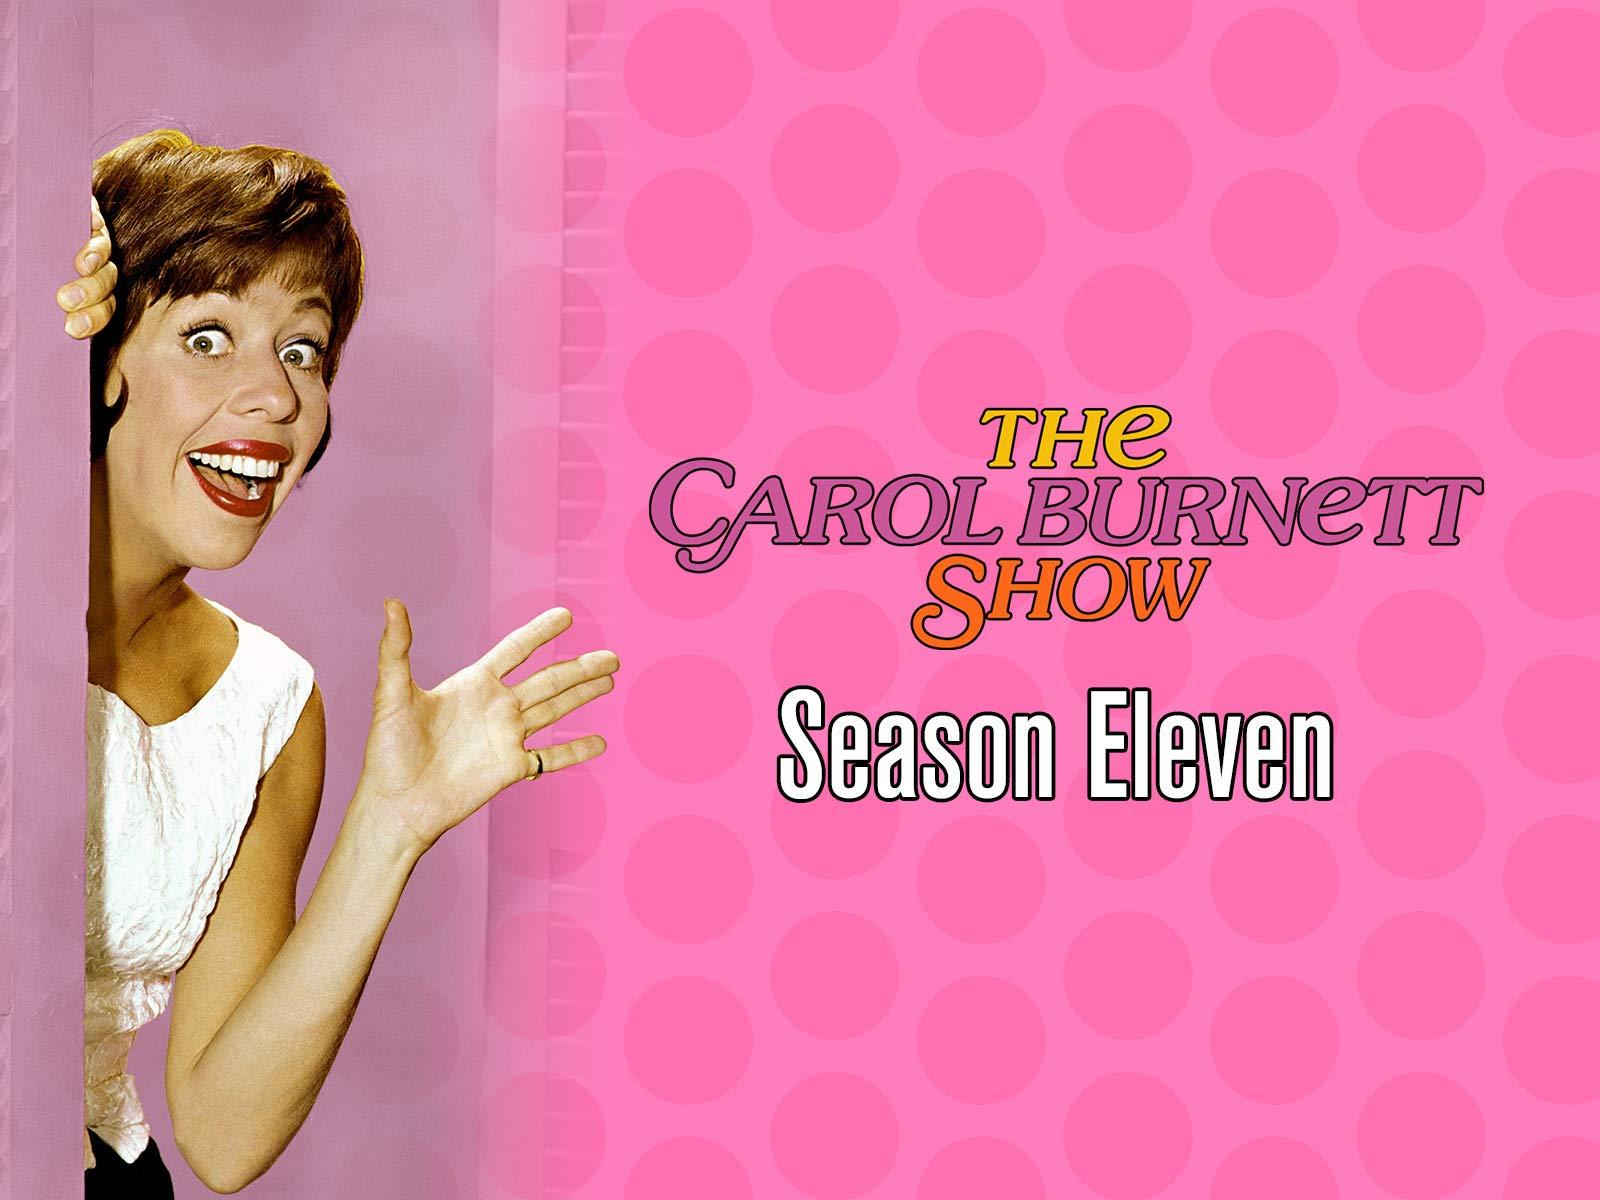 The Carol Burnett Show - Season 11